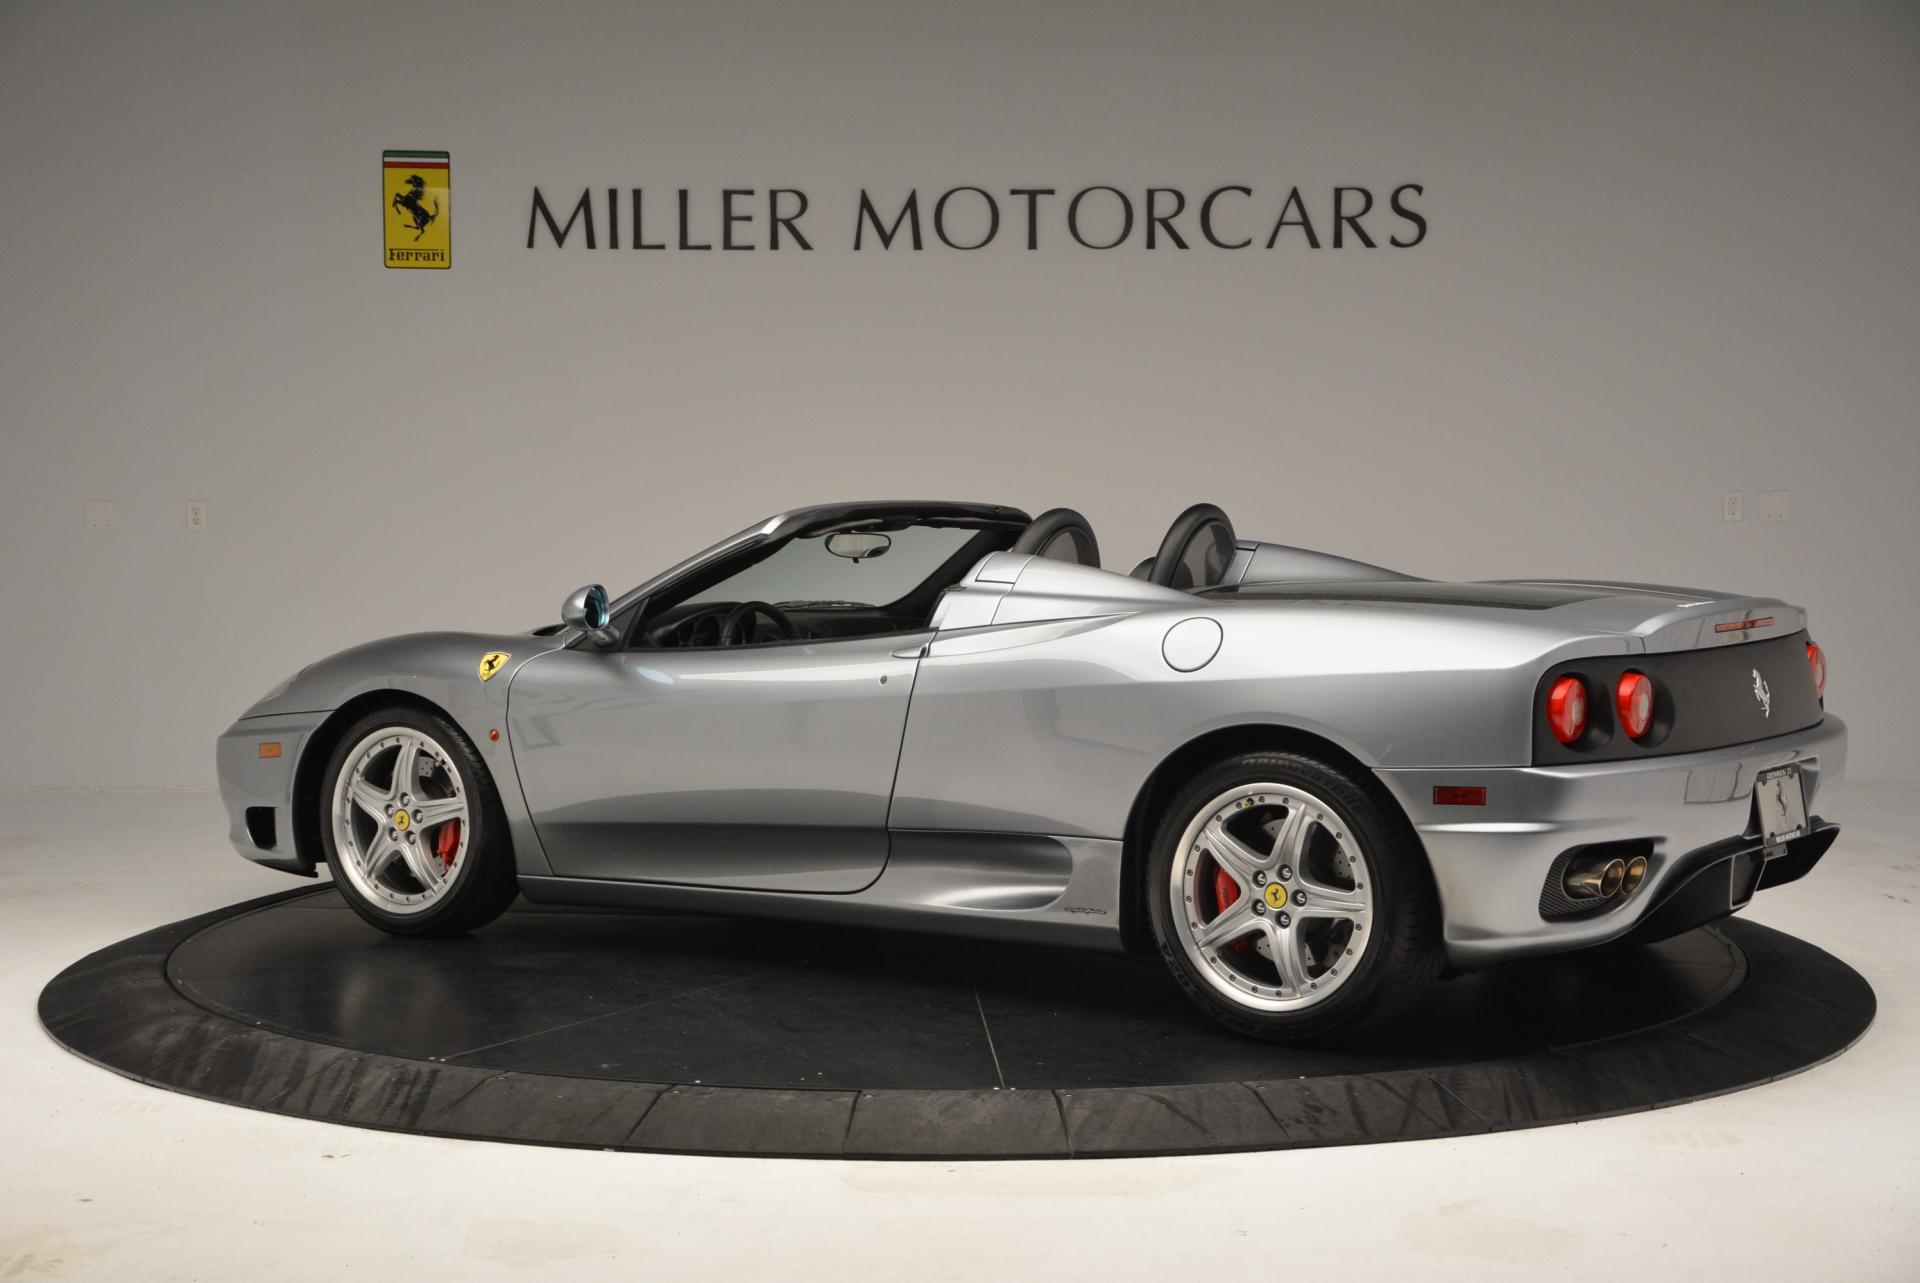 Used 2004 Ferrari 360 Spider 6-Speed Manual  For Sale In Greenwich, CT. Alfa Romeo of Greenwich, 4317 138_p4